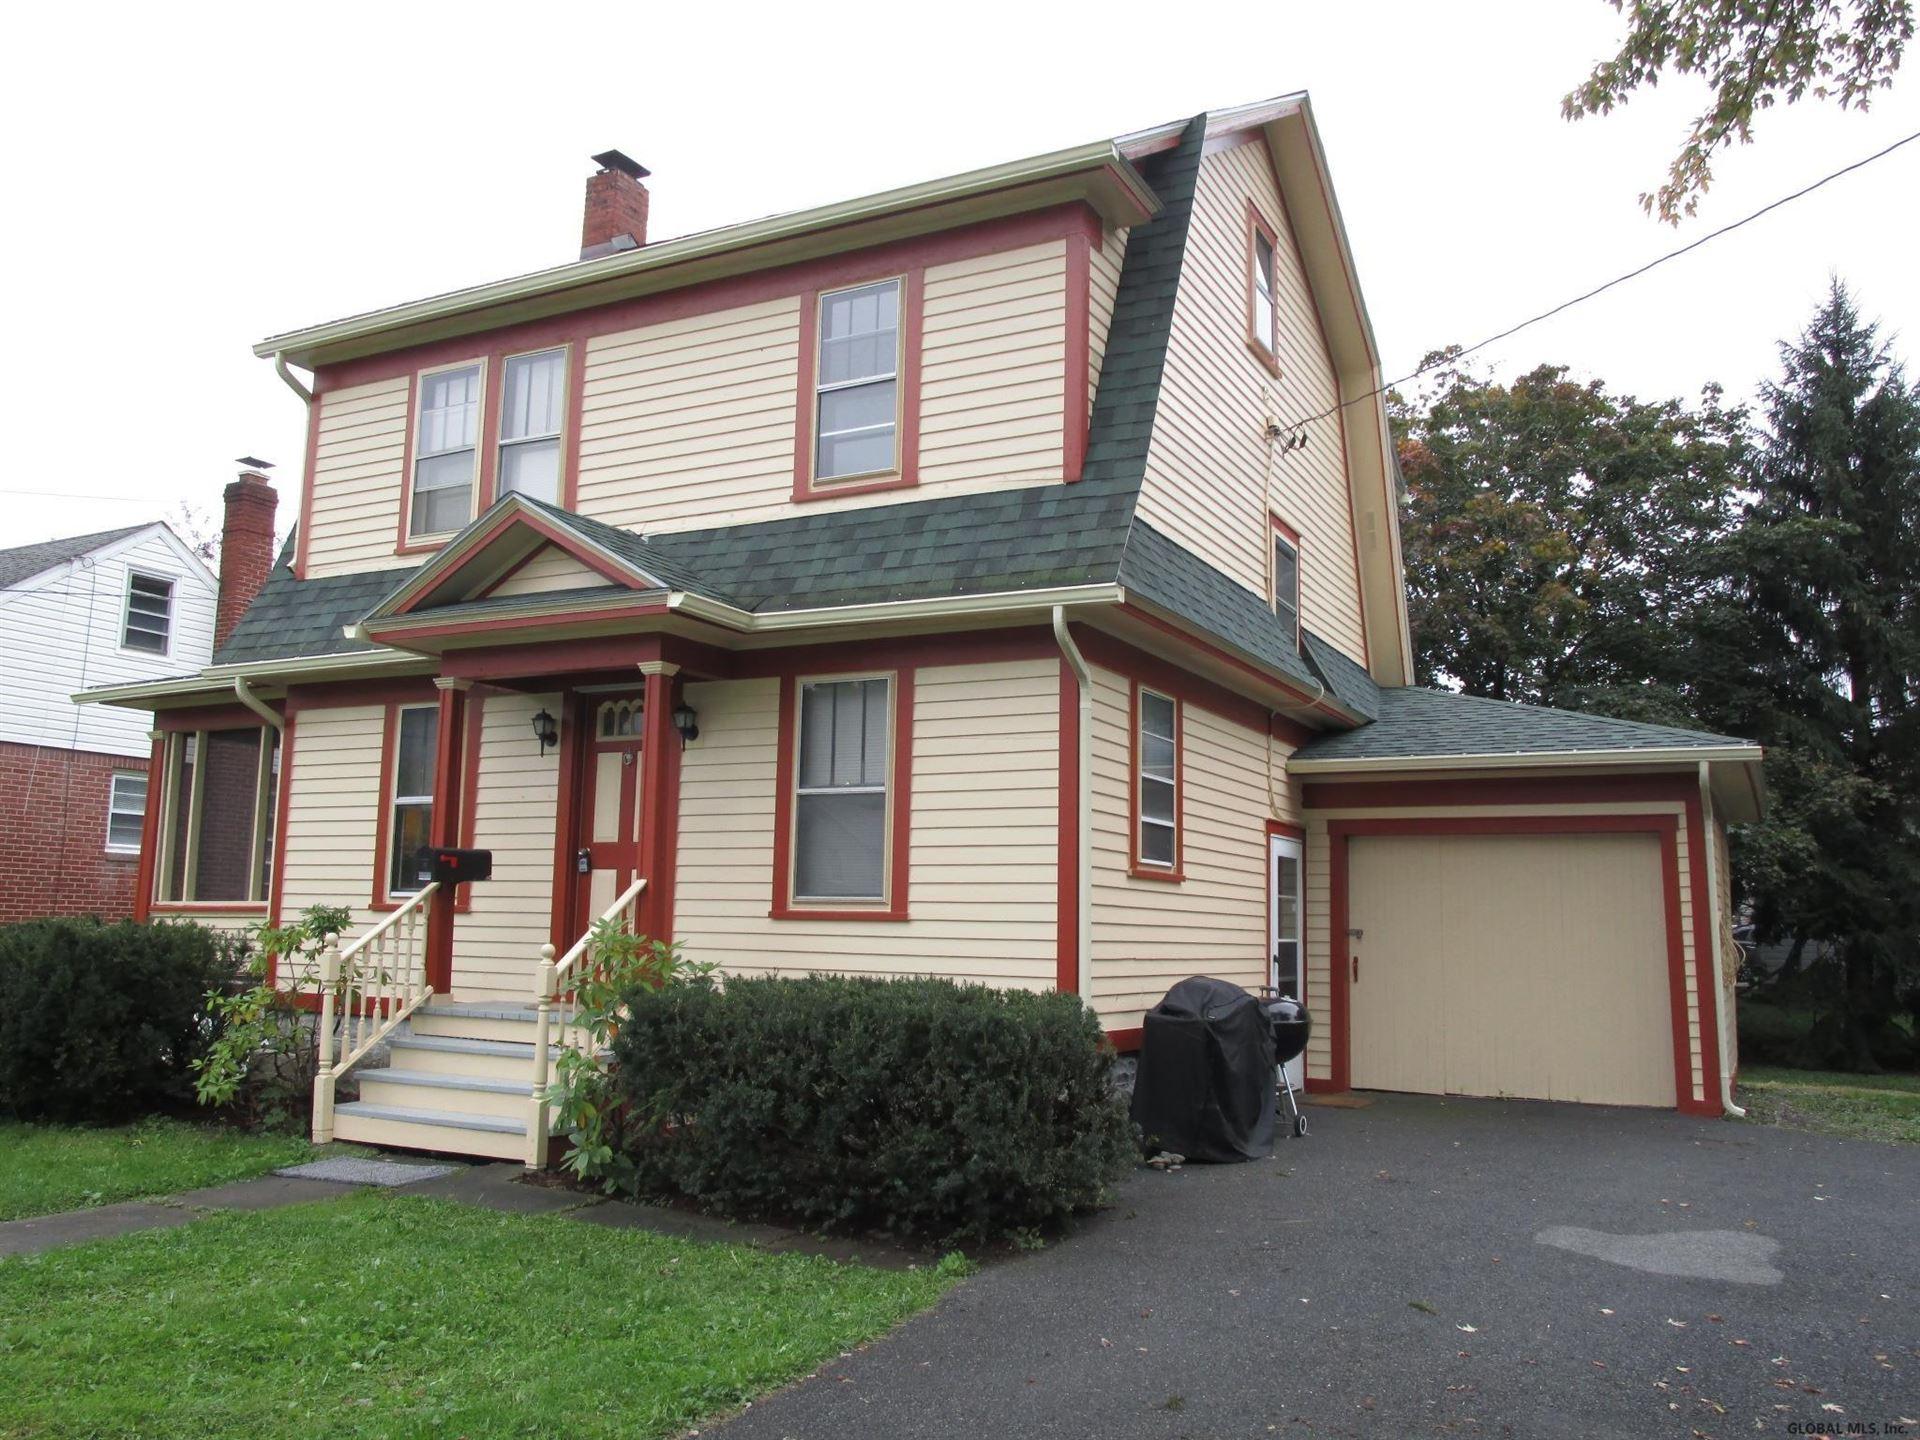 177 ELM ST, Cobleskill, NY 12043 - MLS#: 202129921